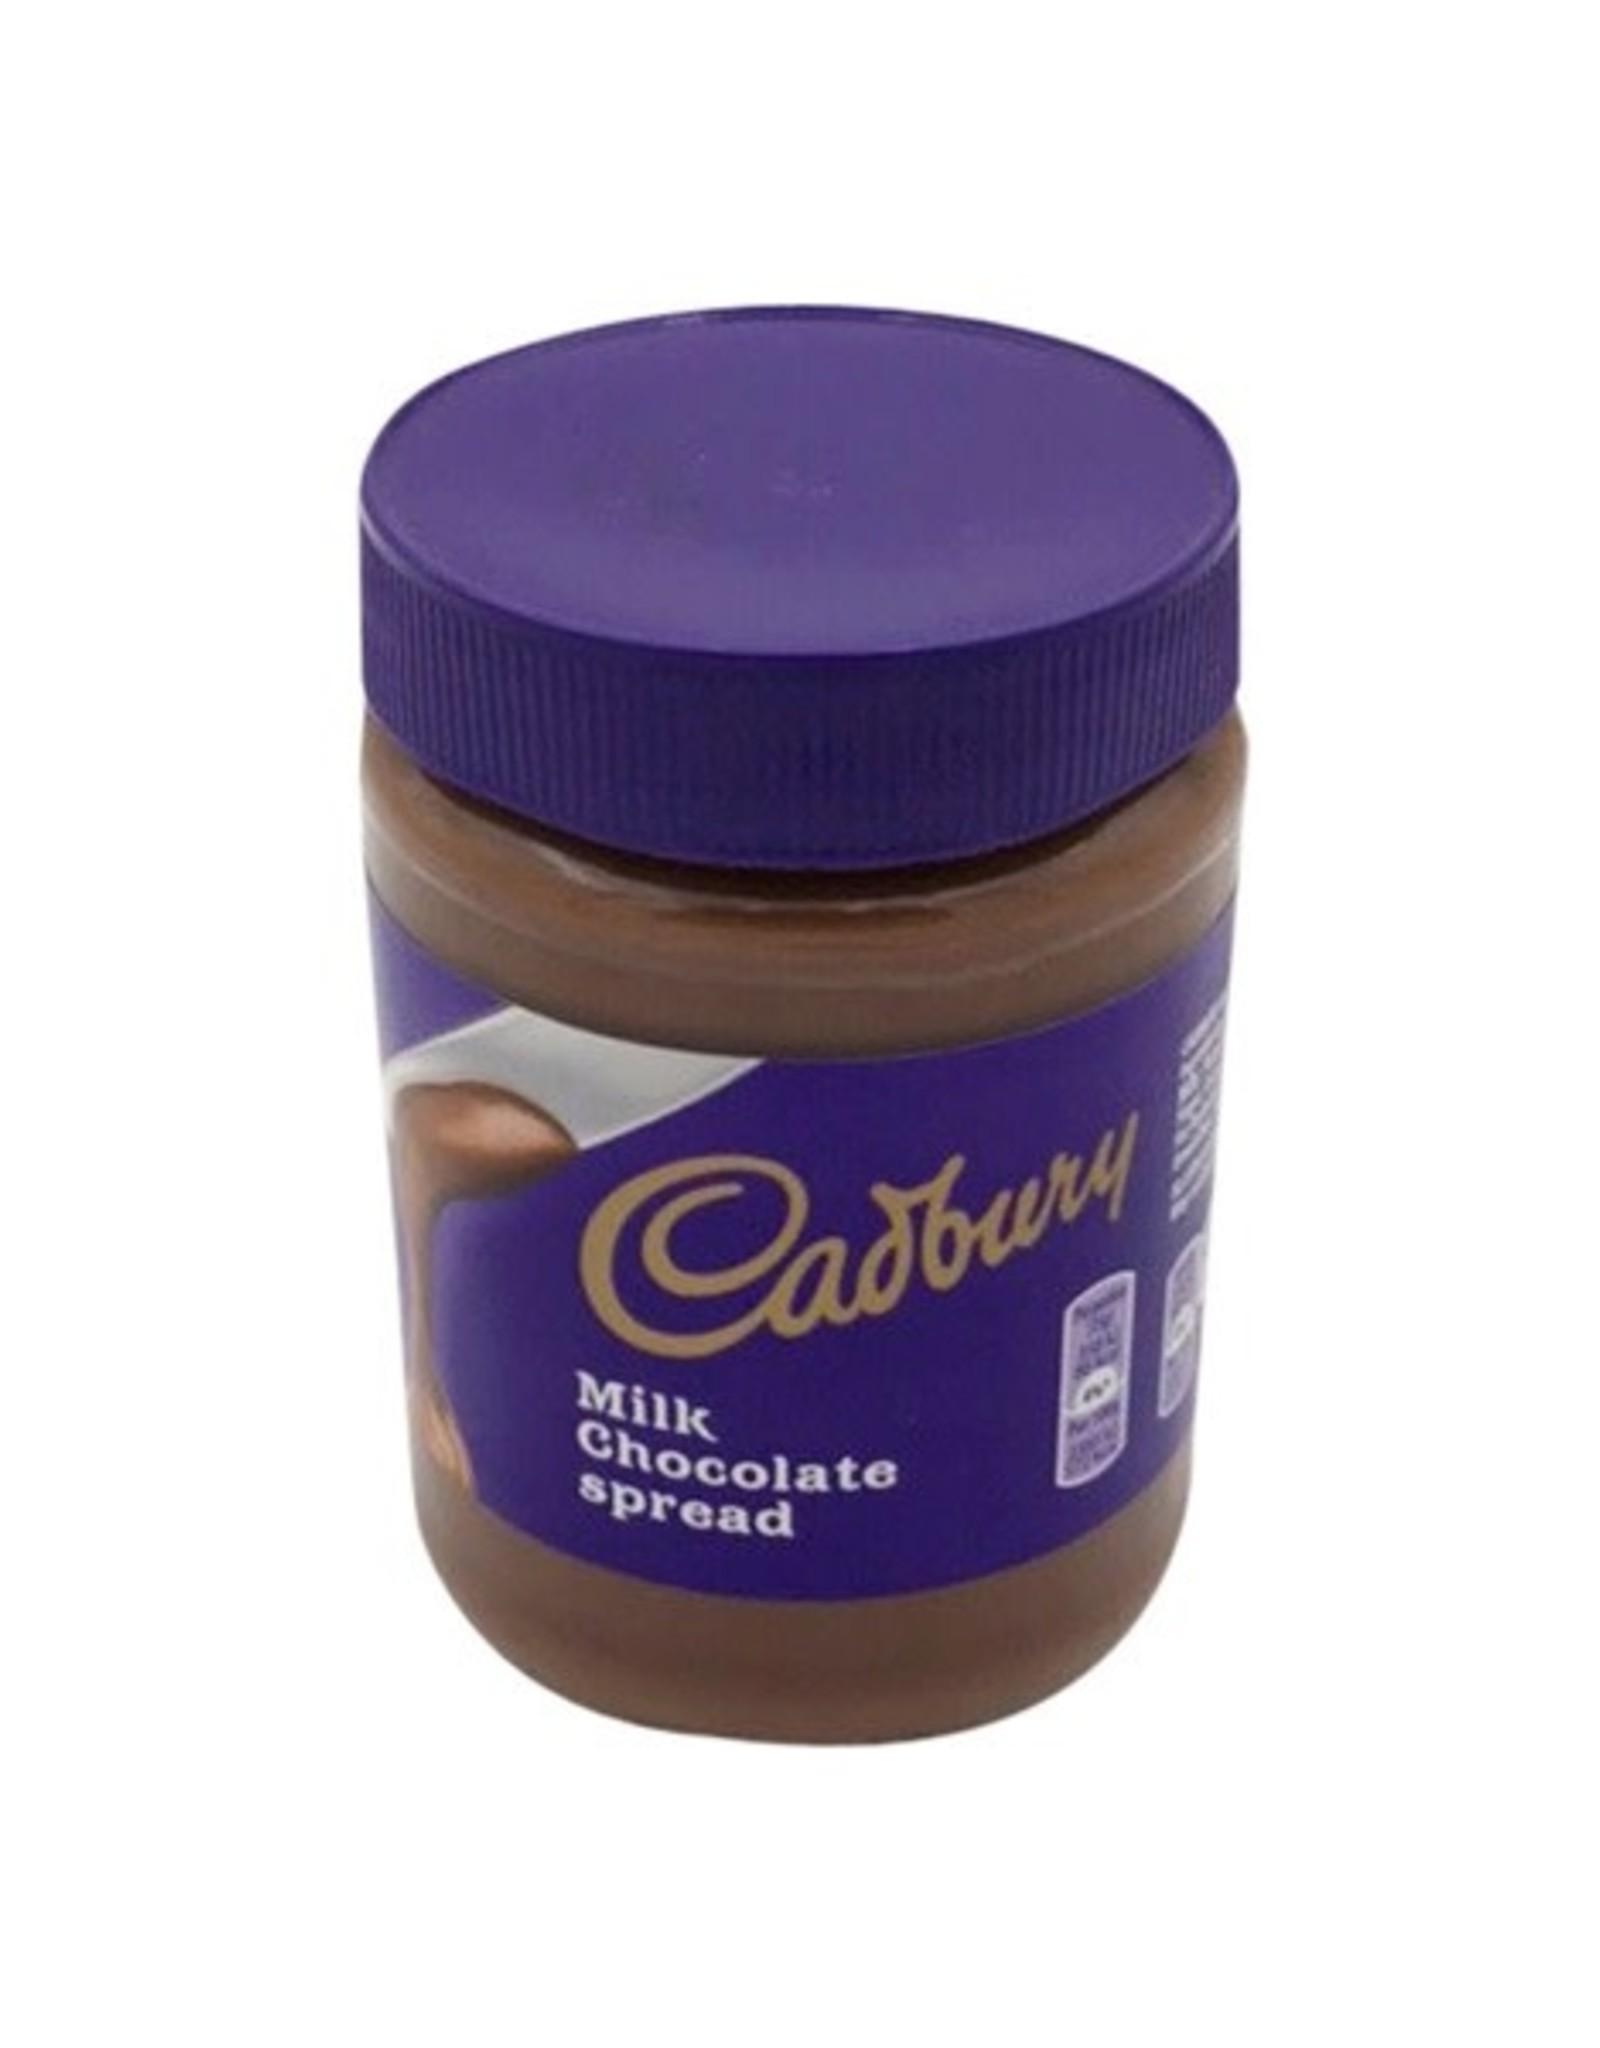 Cadbury Cadbury Milk Chocolate Spread 400 g